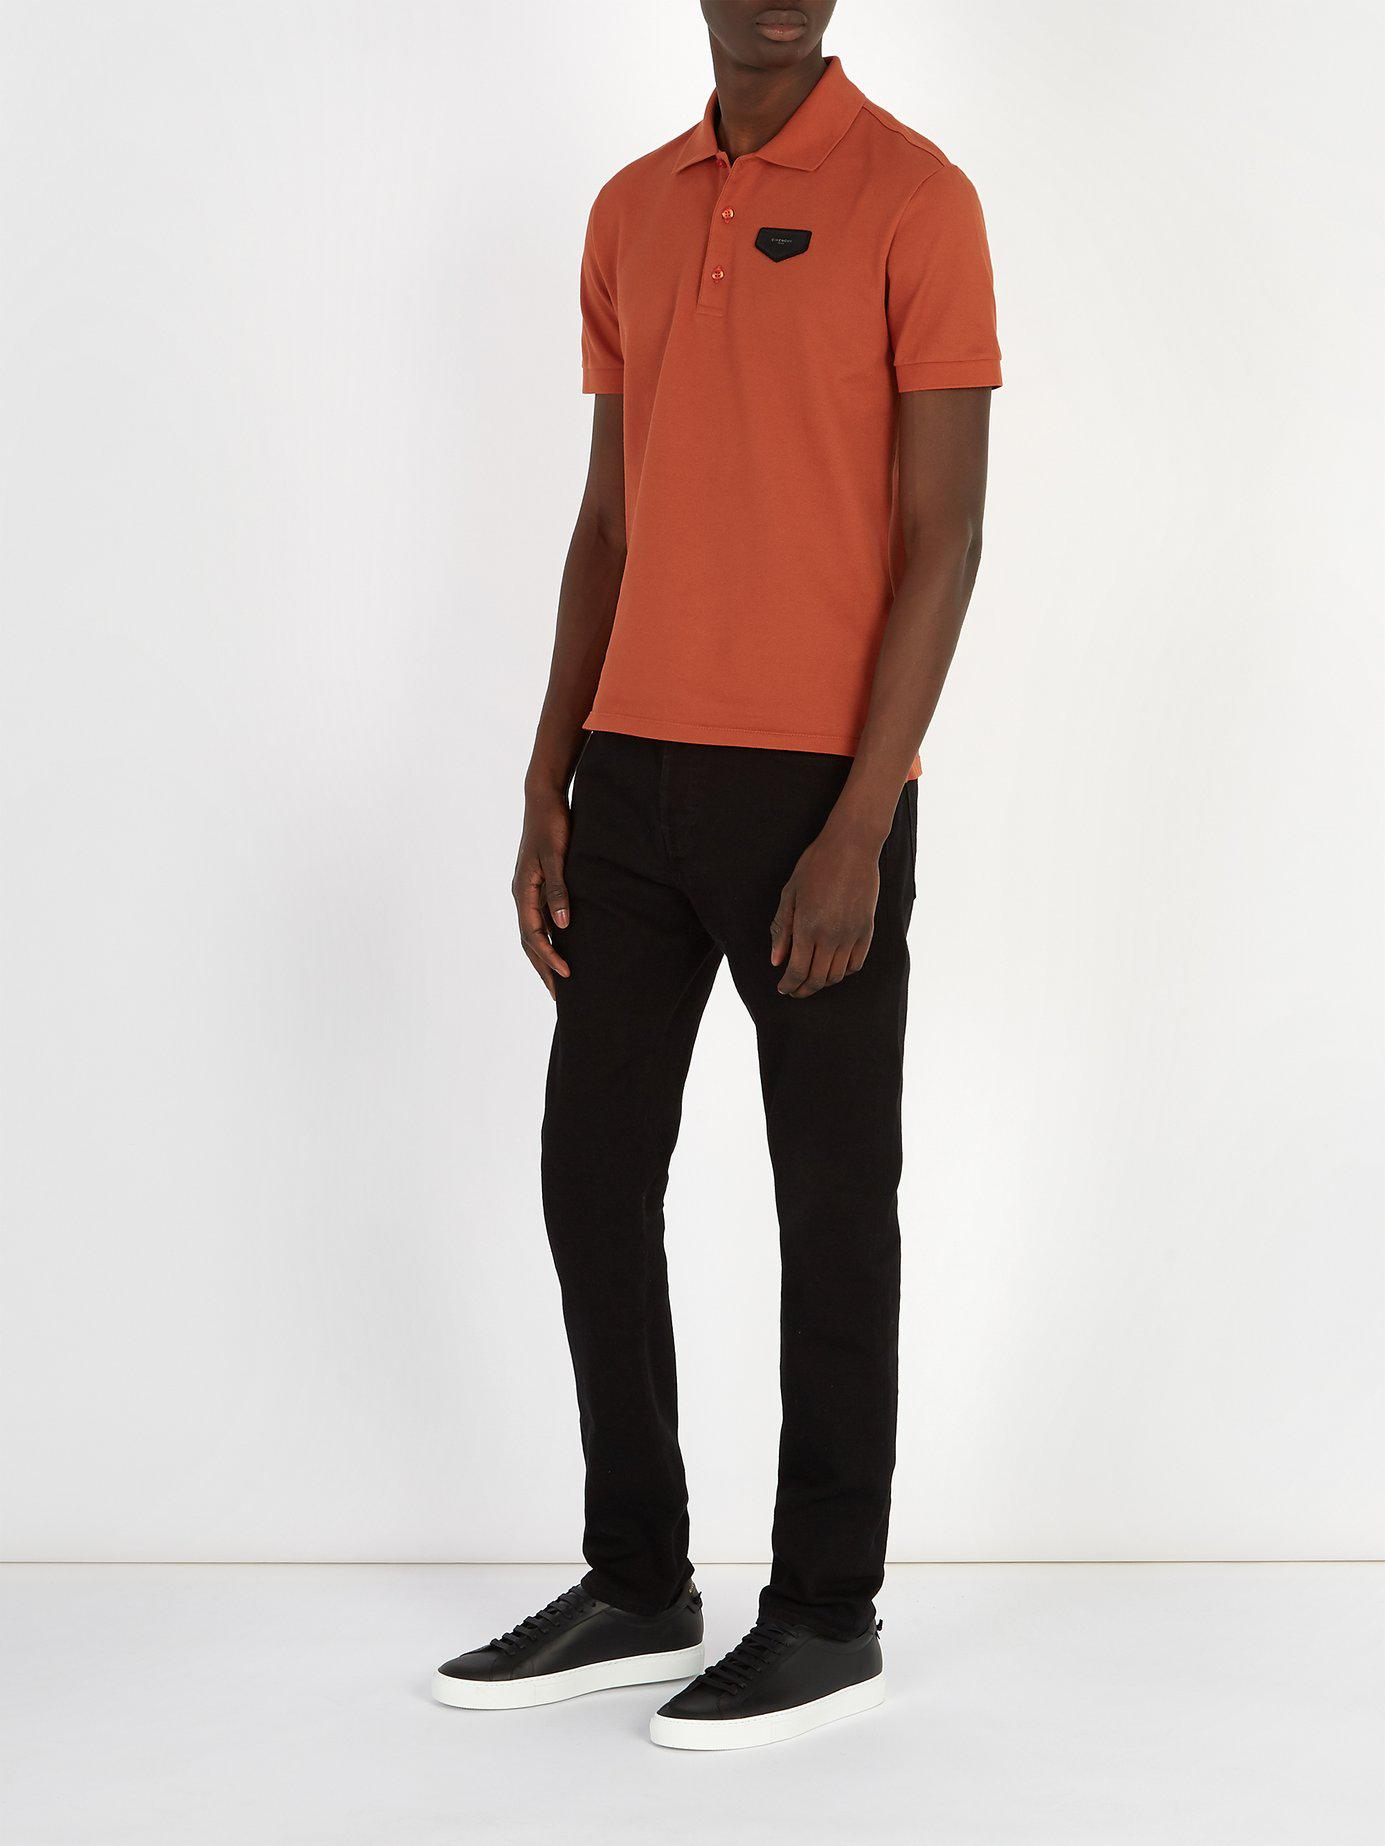 b98a89974 Givenchy Antigona Patch Polo Shirt in Orange for Men - Lyst